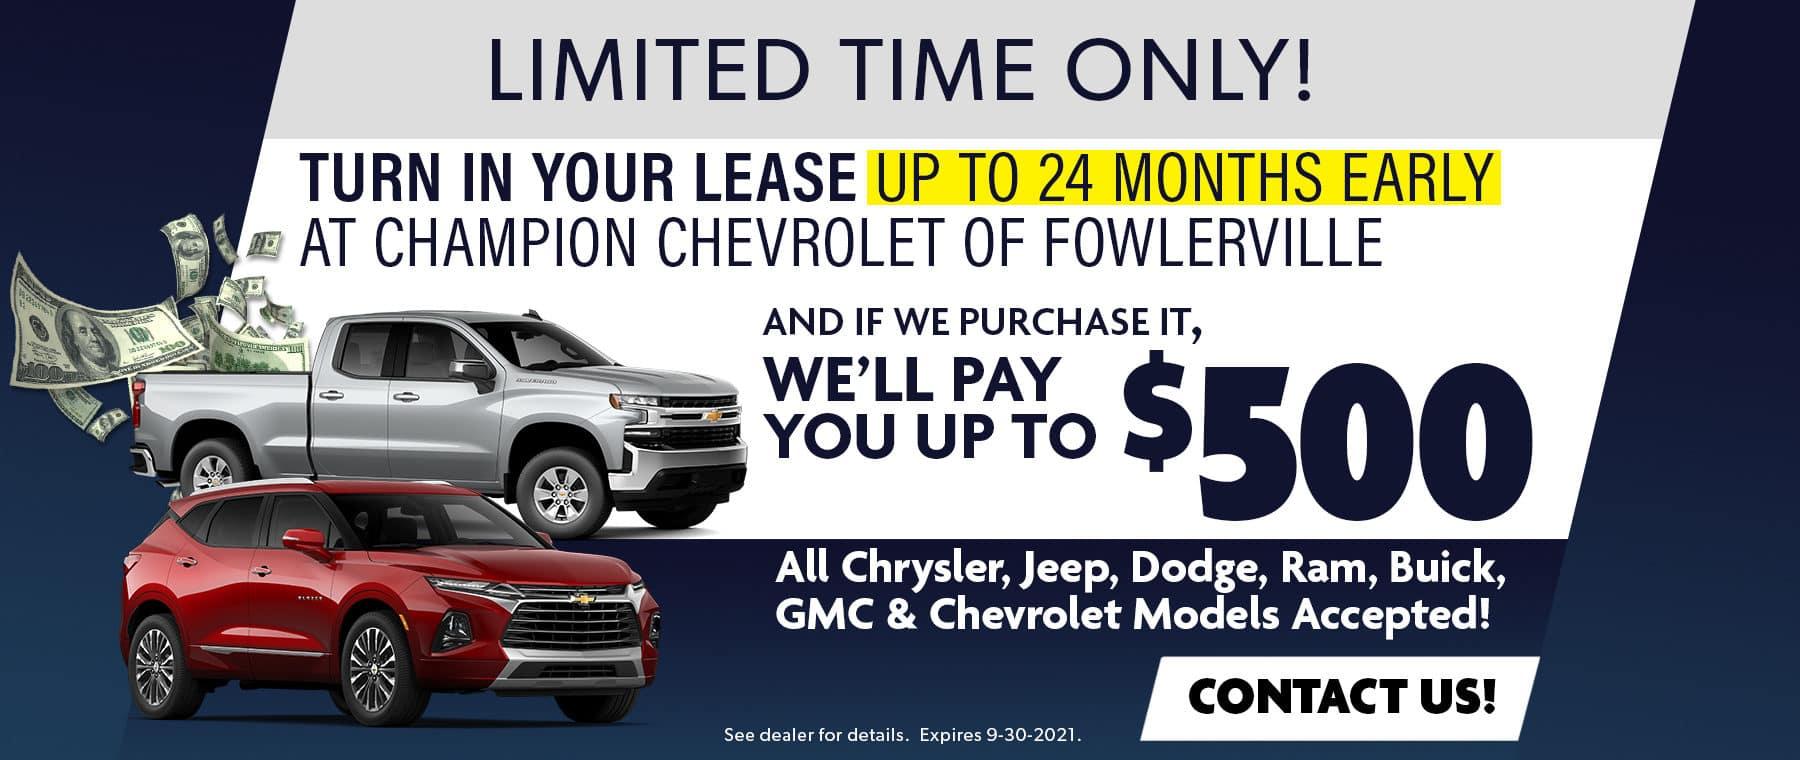 9_21_Champion_Fowlerville_Chevrolet_1800x760_lease_web_banner